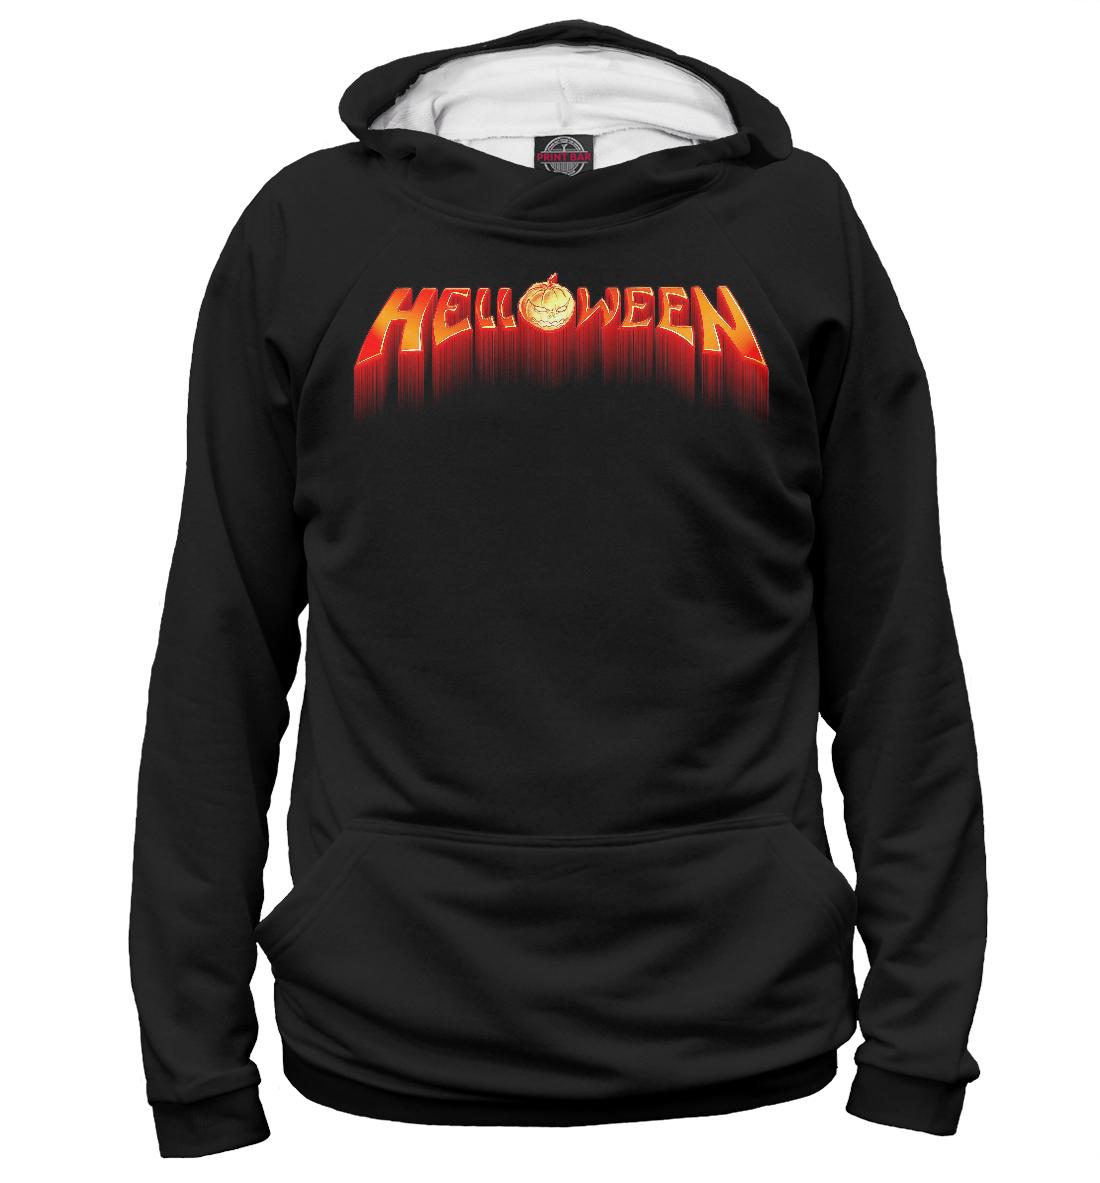 Купить Helloween, Printbar, Худи, MZK-317323-hud-1